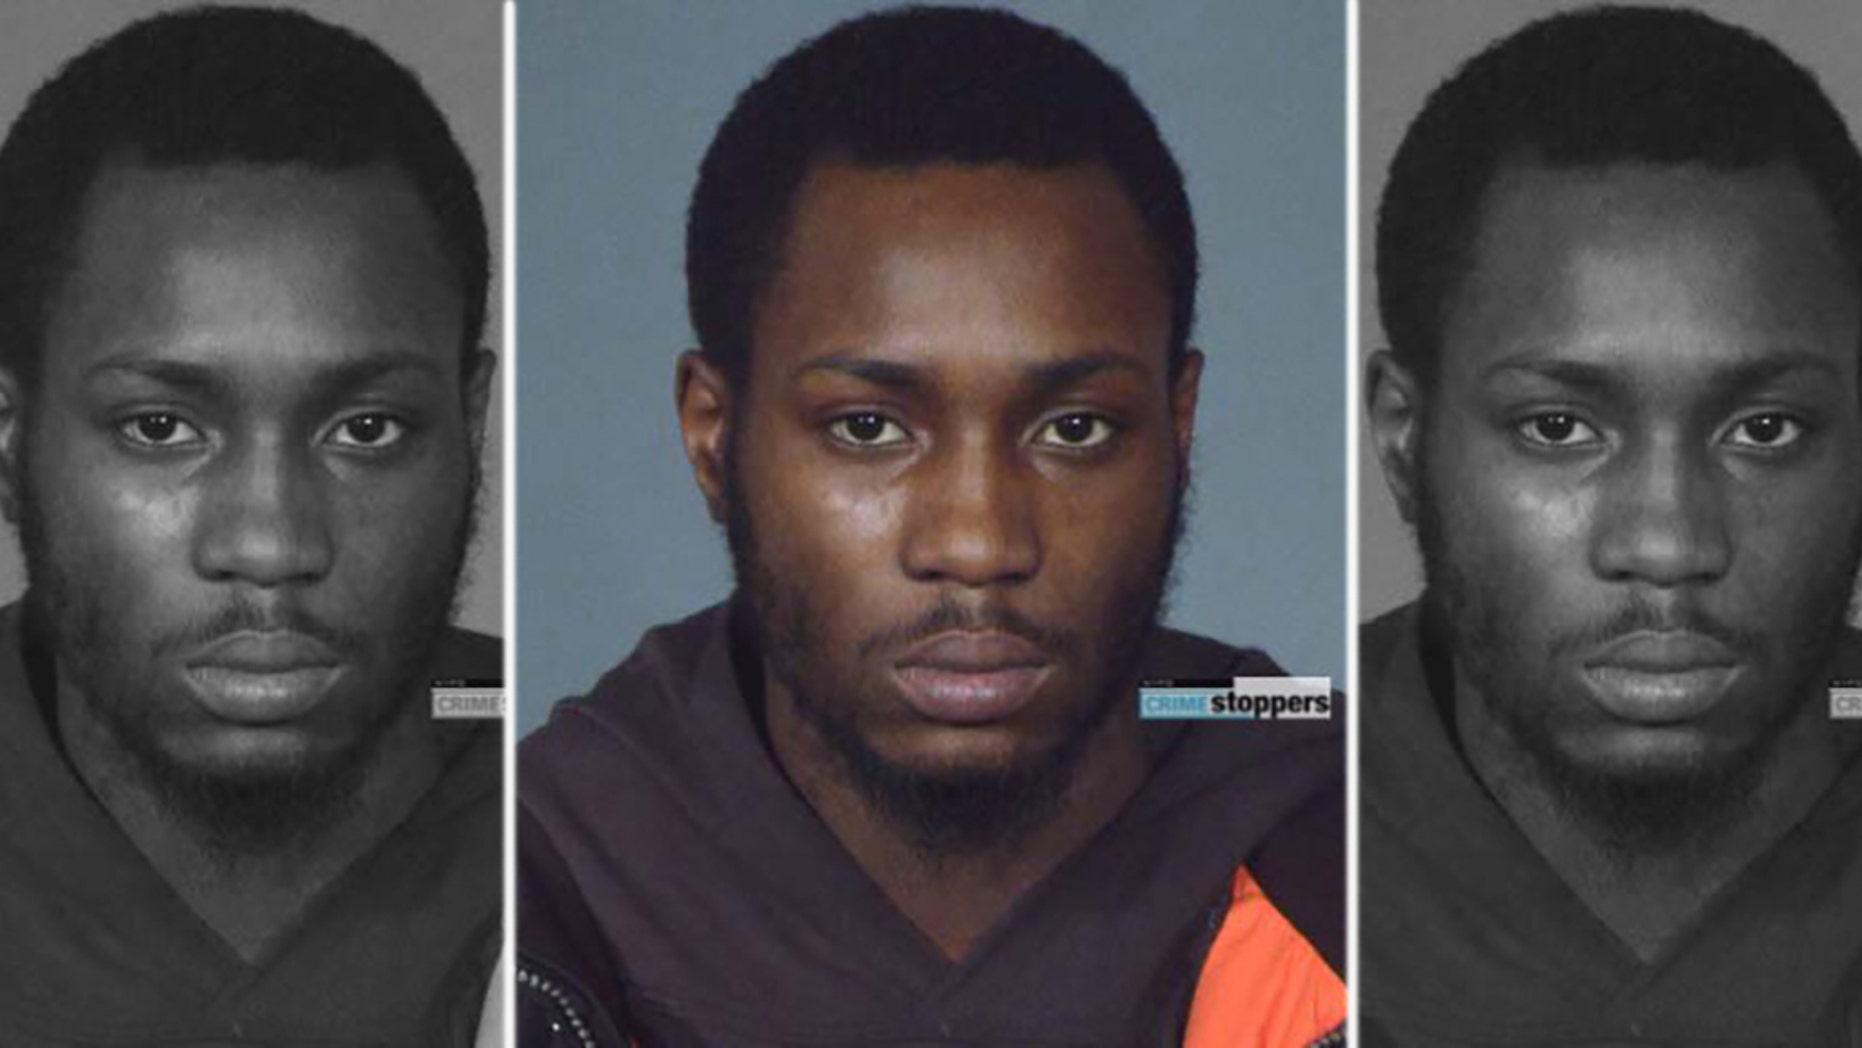 Mugshot for Tyrone Johnson, 24